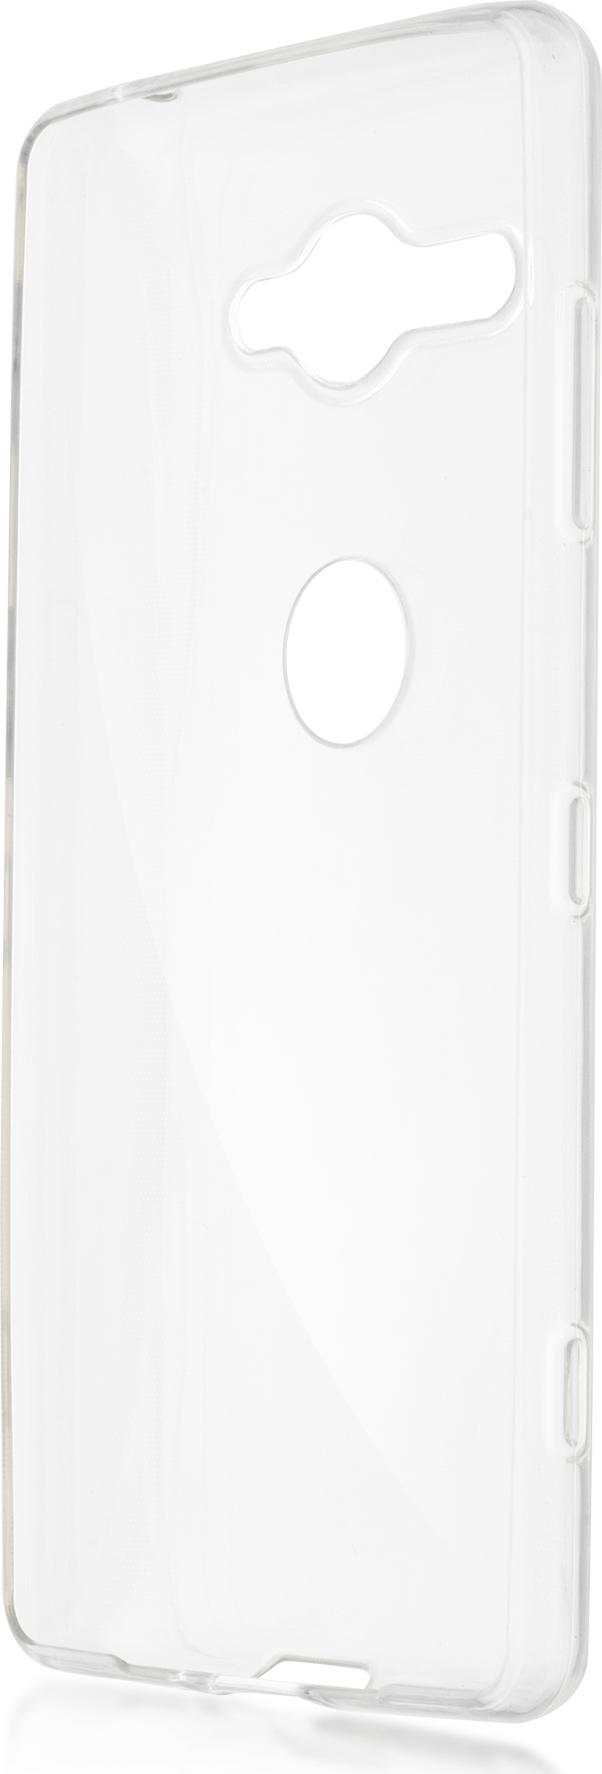 Чехол Brosco TPU для Sony Xperia XZ2 Compact, прозрачный аксессуар чехол для sony xperia xz2 compact brosco transparent xz2c tpu transparent